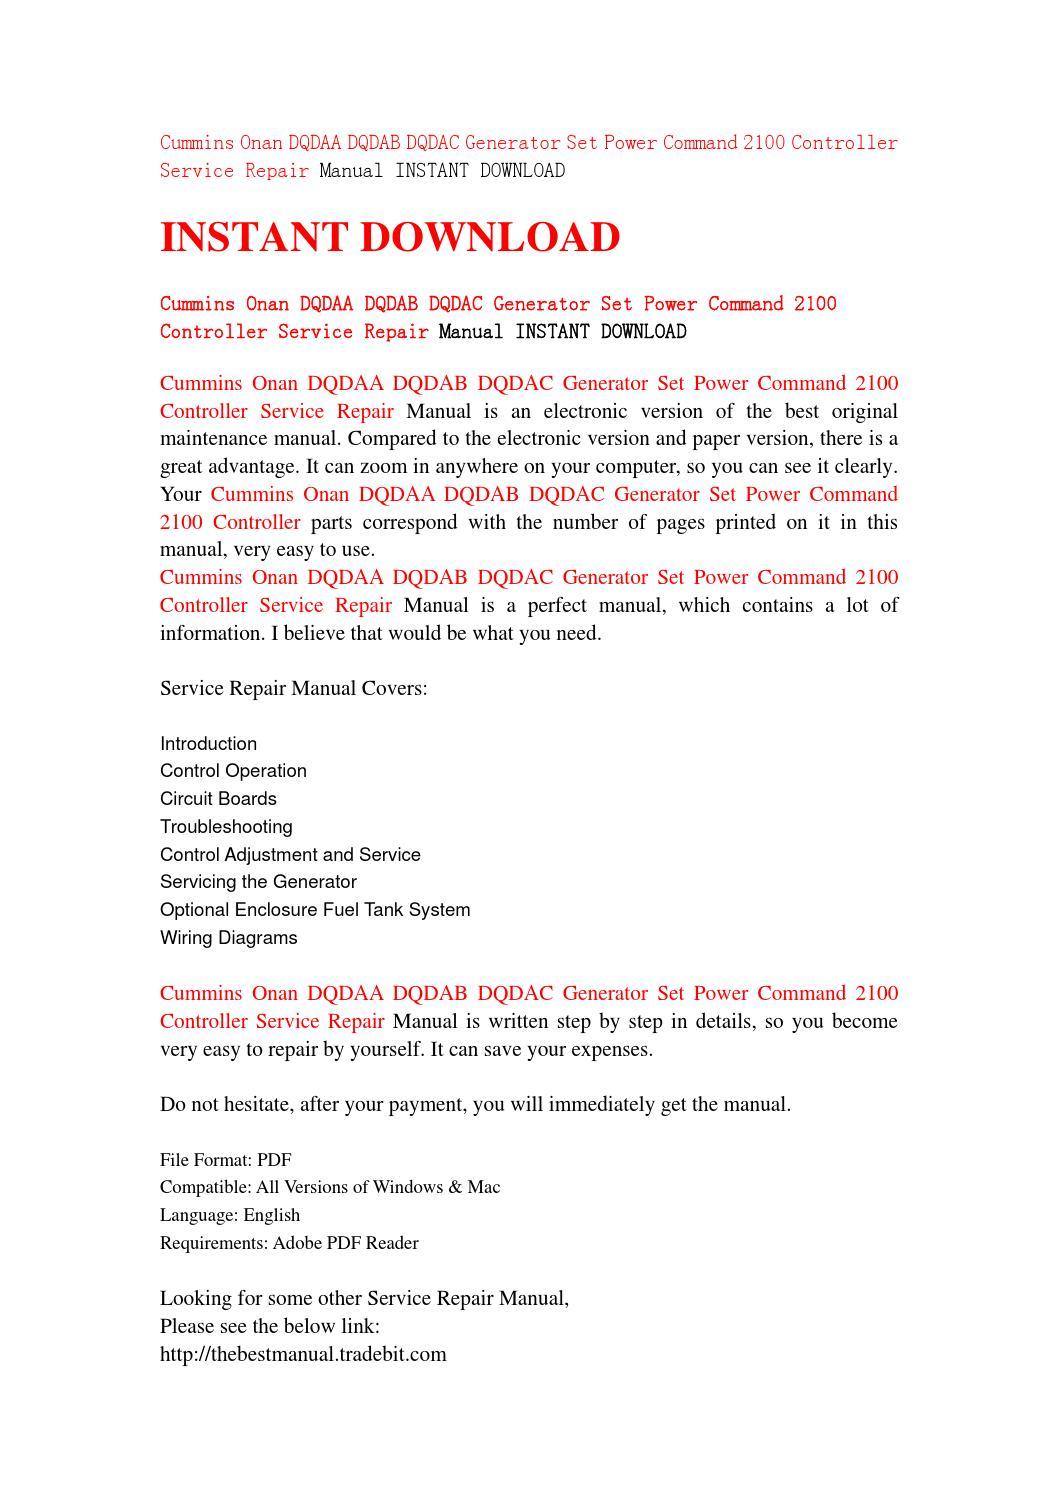 Cummins onan dqdaa dqdab dqdac generator set power command 2100 controller service  repair manual ins by jhsjefn7 - issuu